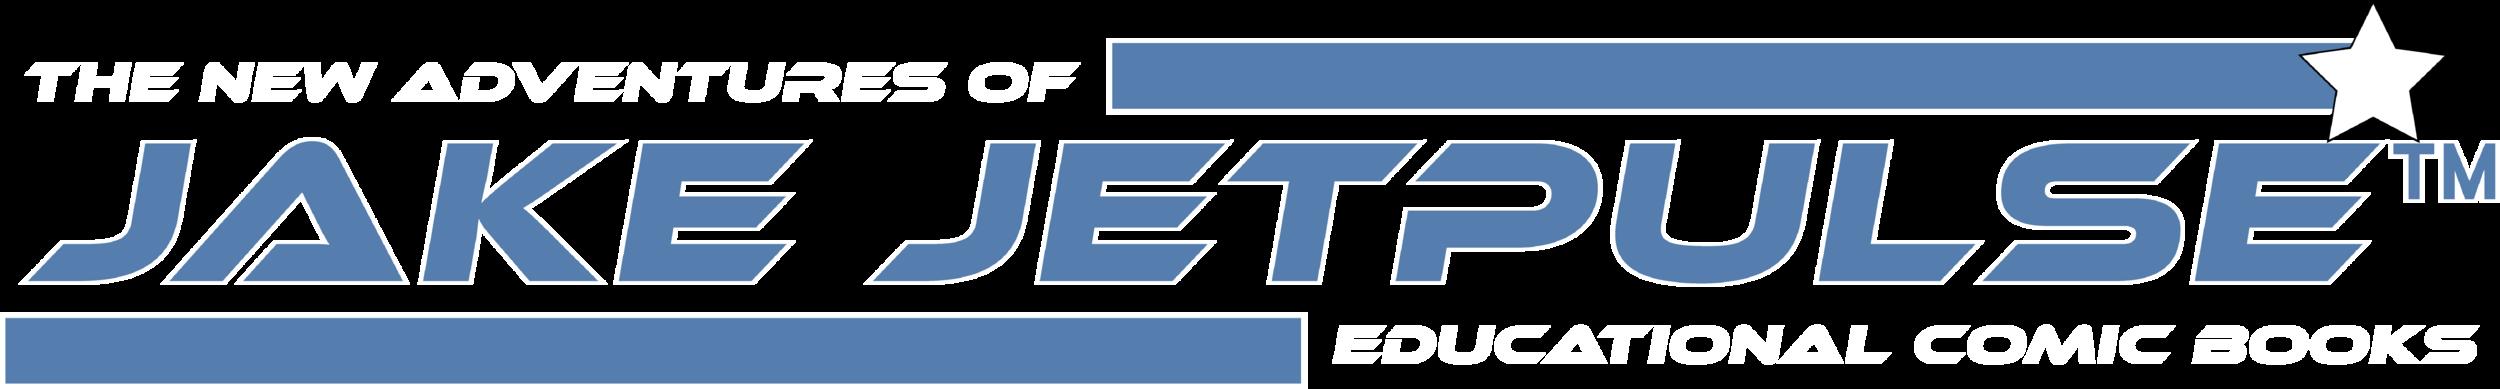 new_jetpulse_logo.png